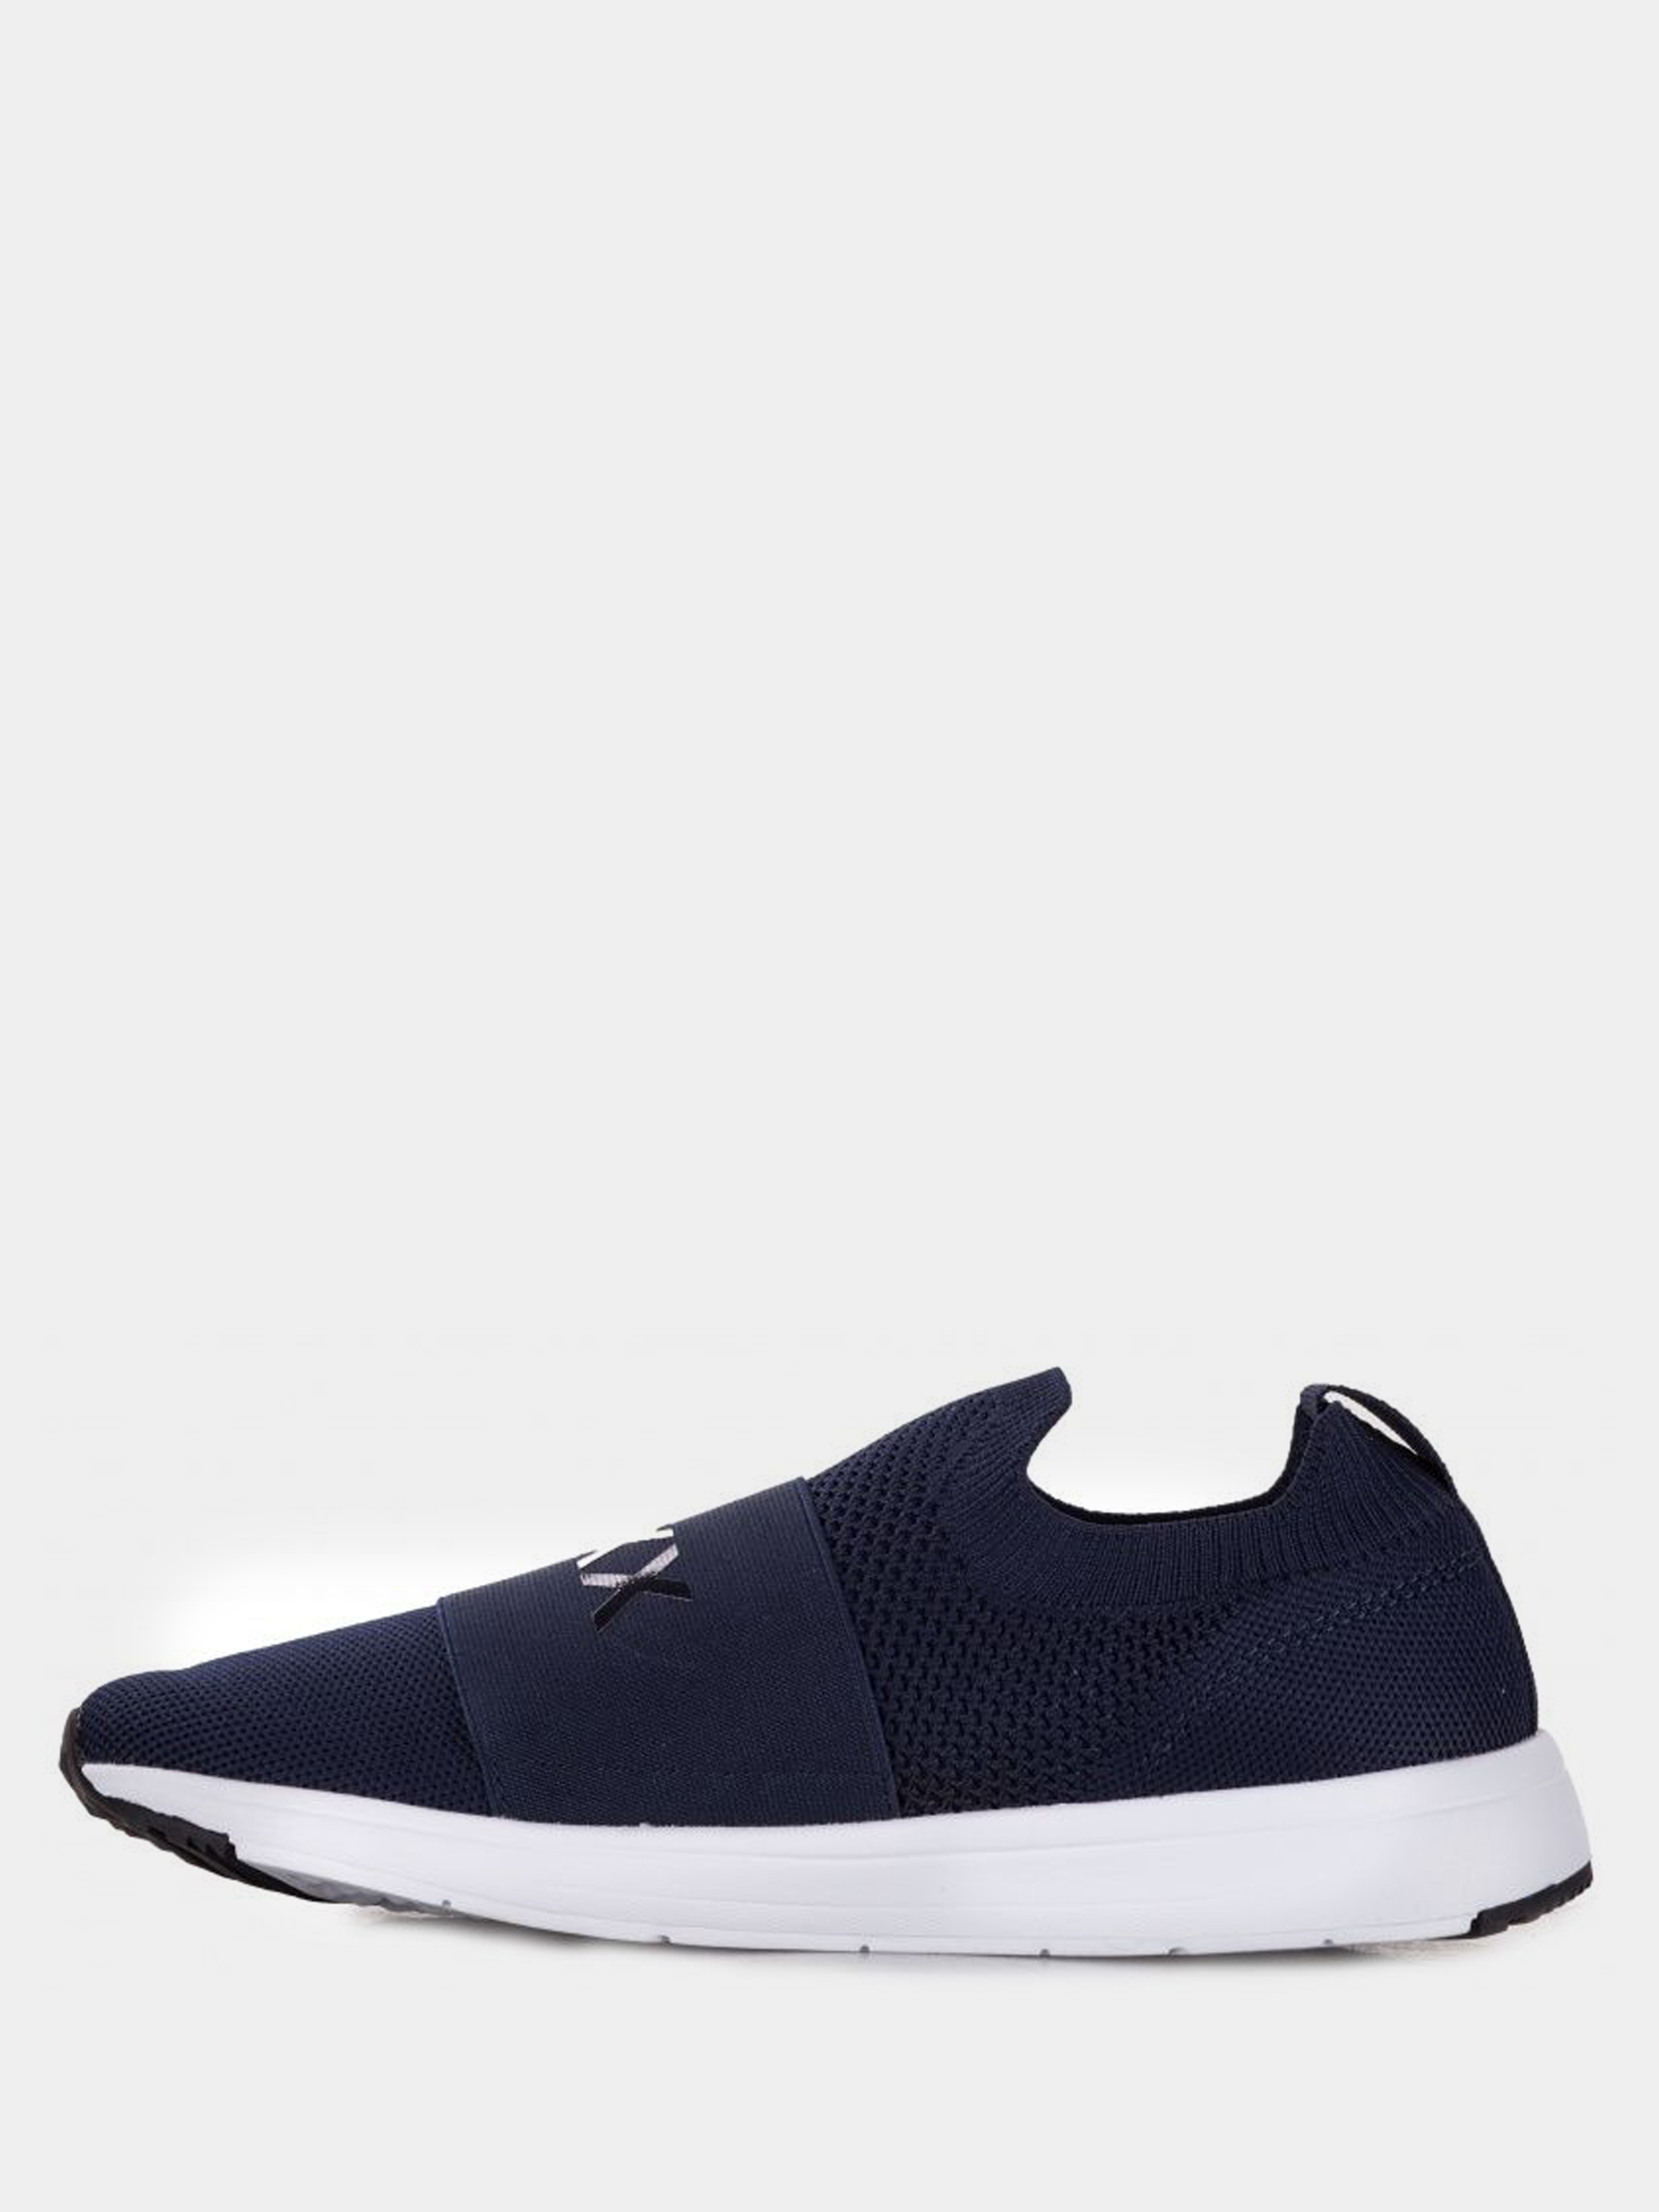 Кроссовки для мужчин MEXX Chento 7M21 модная обувь, 2017